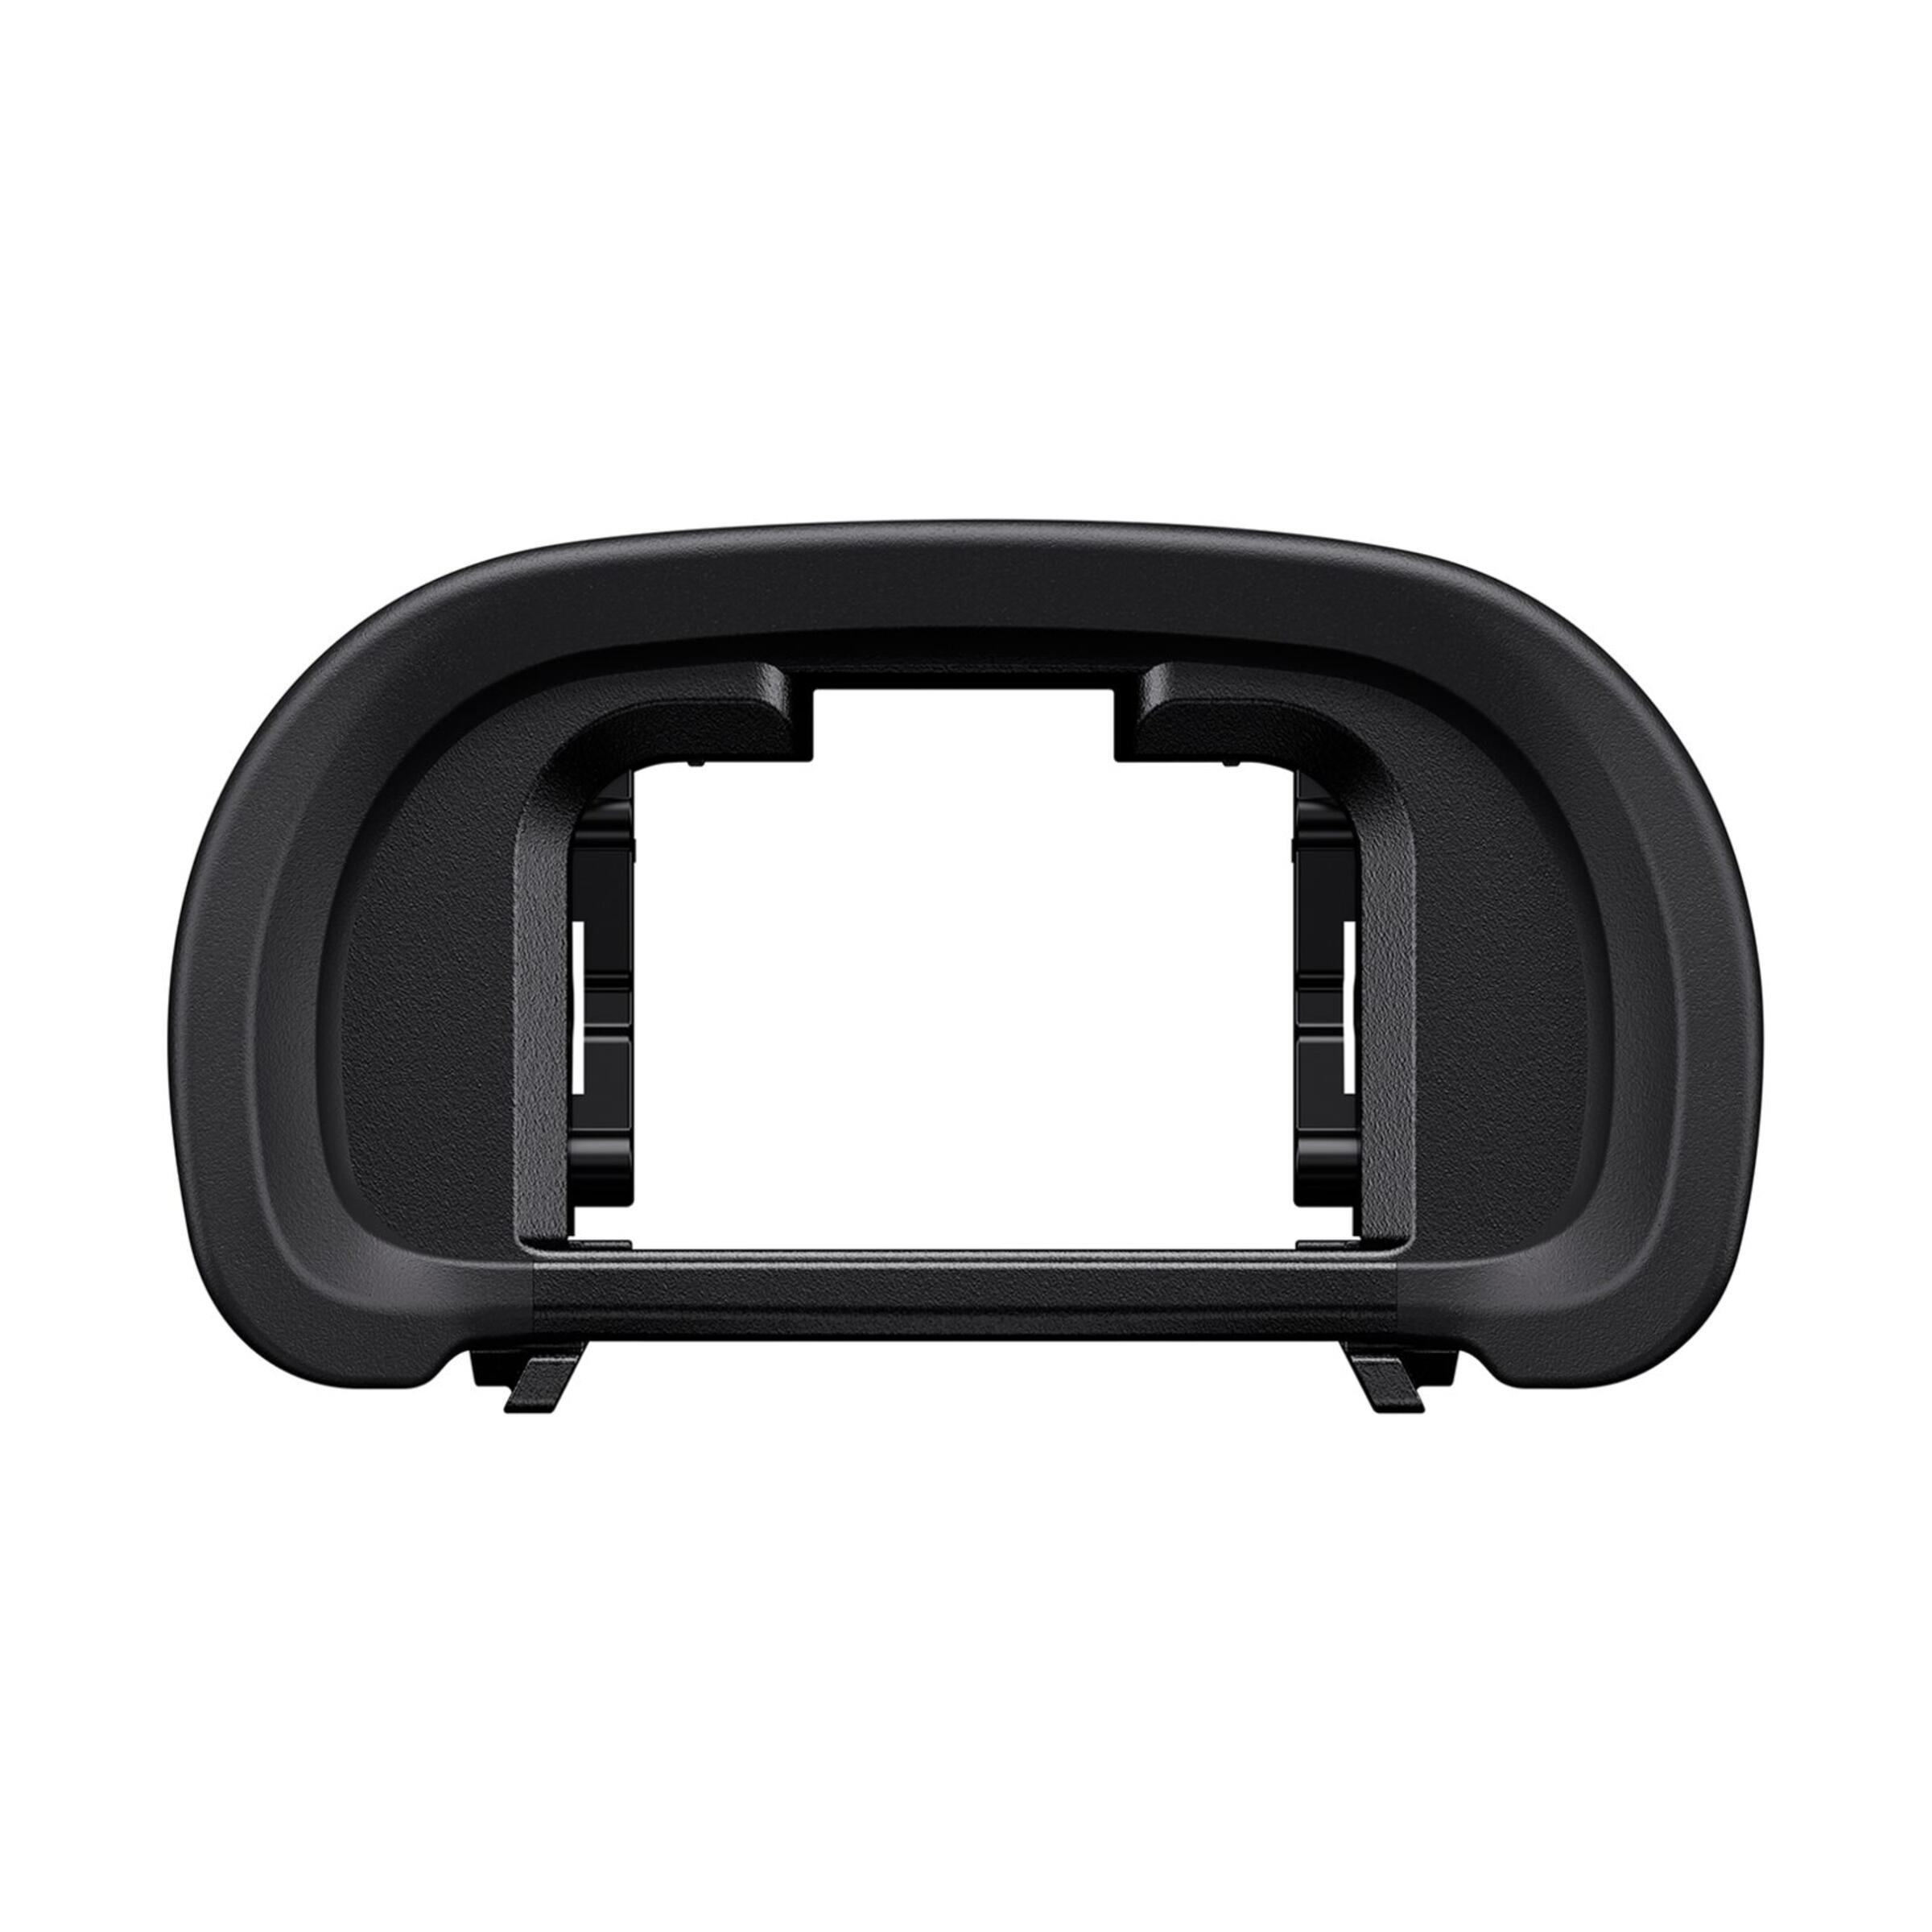 Sony Sony FDA-EP18 Augenmuschel